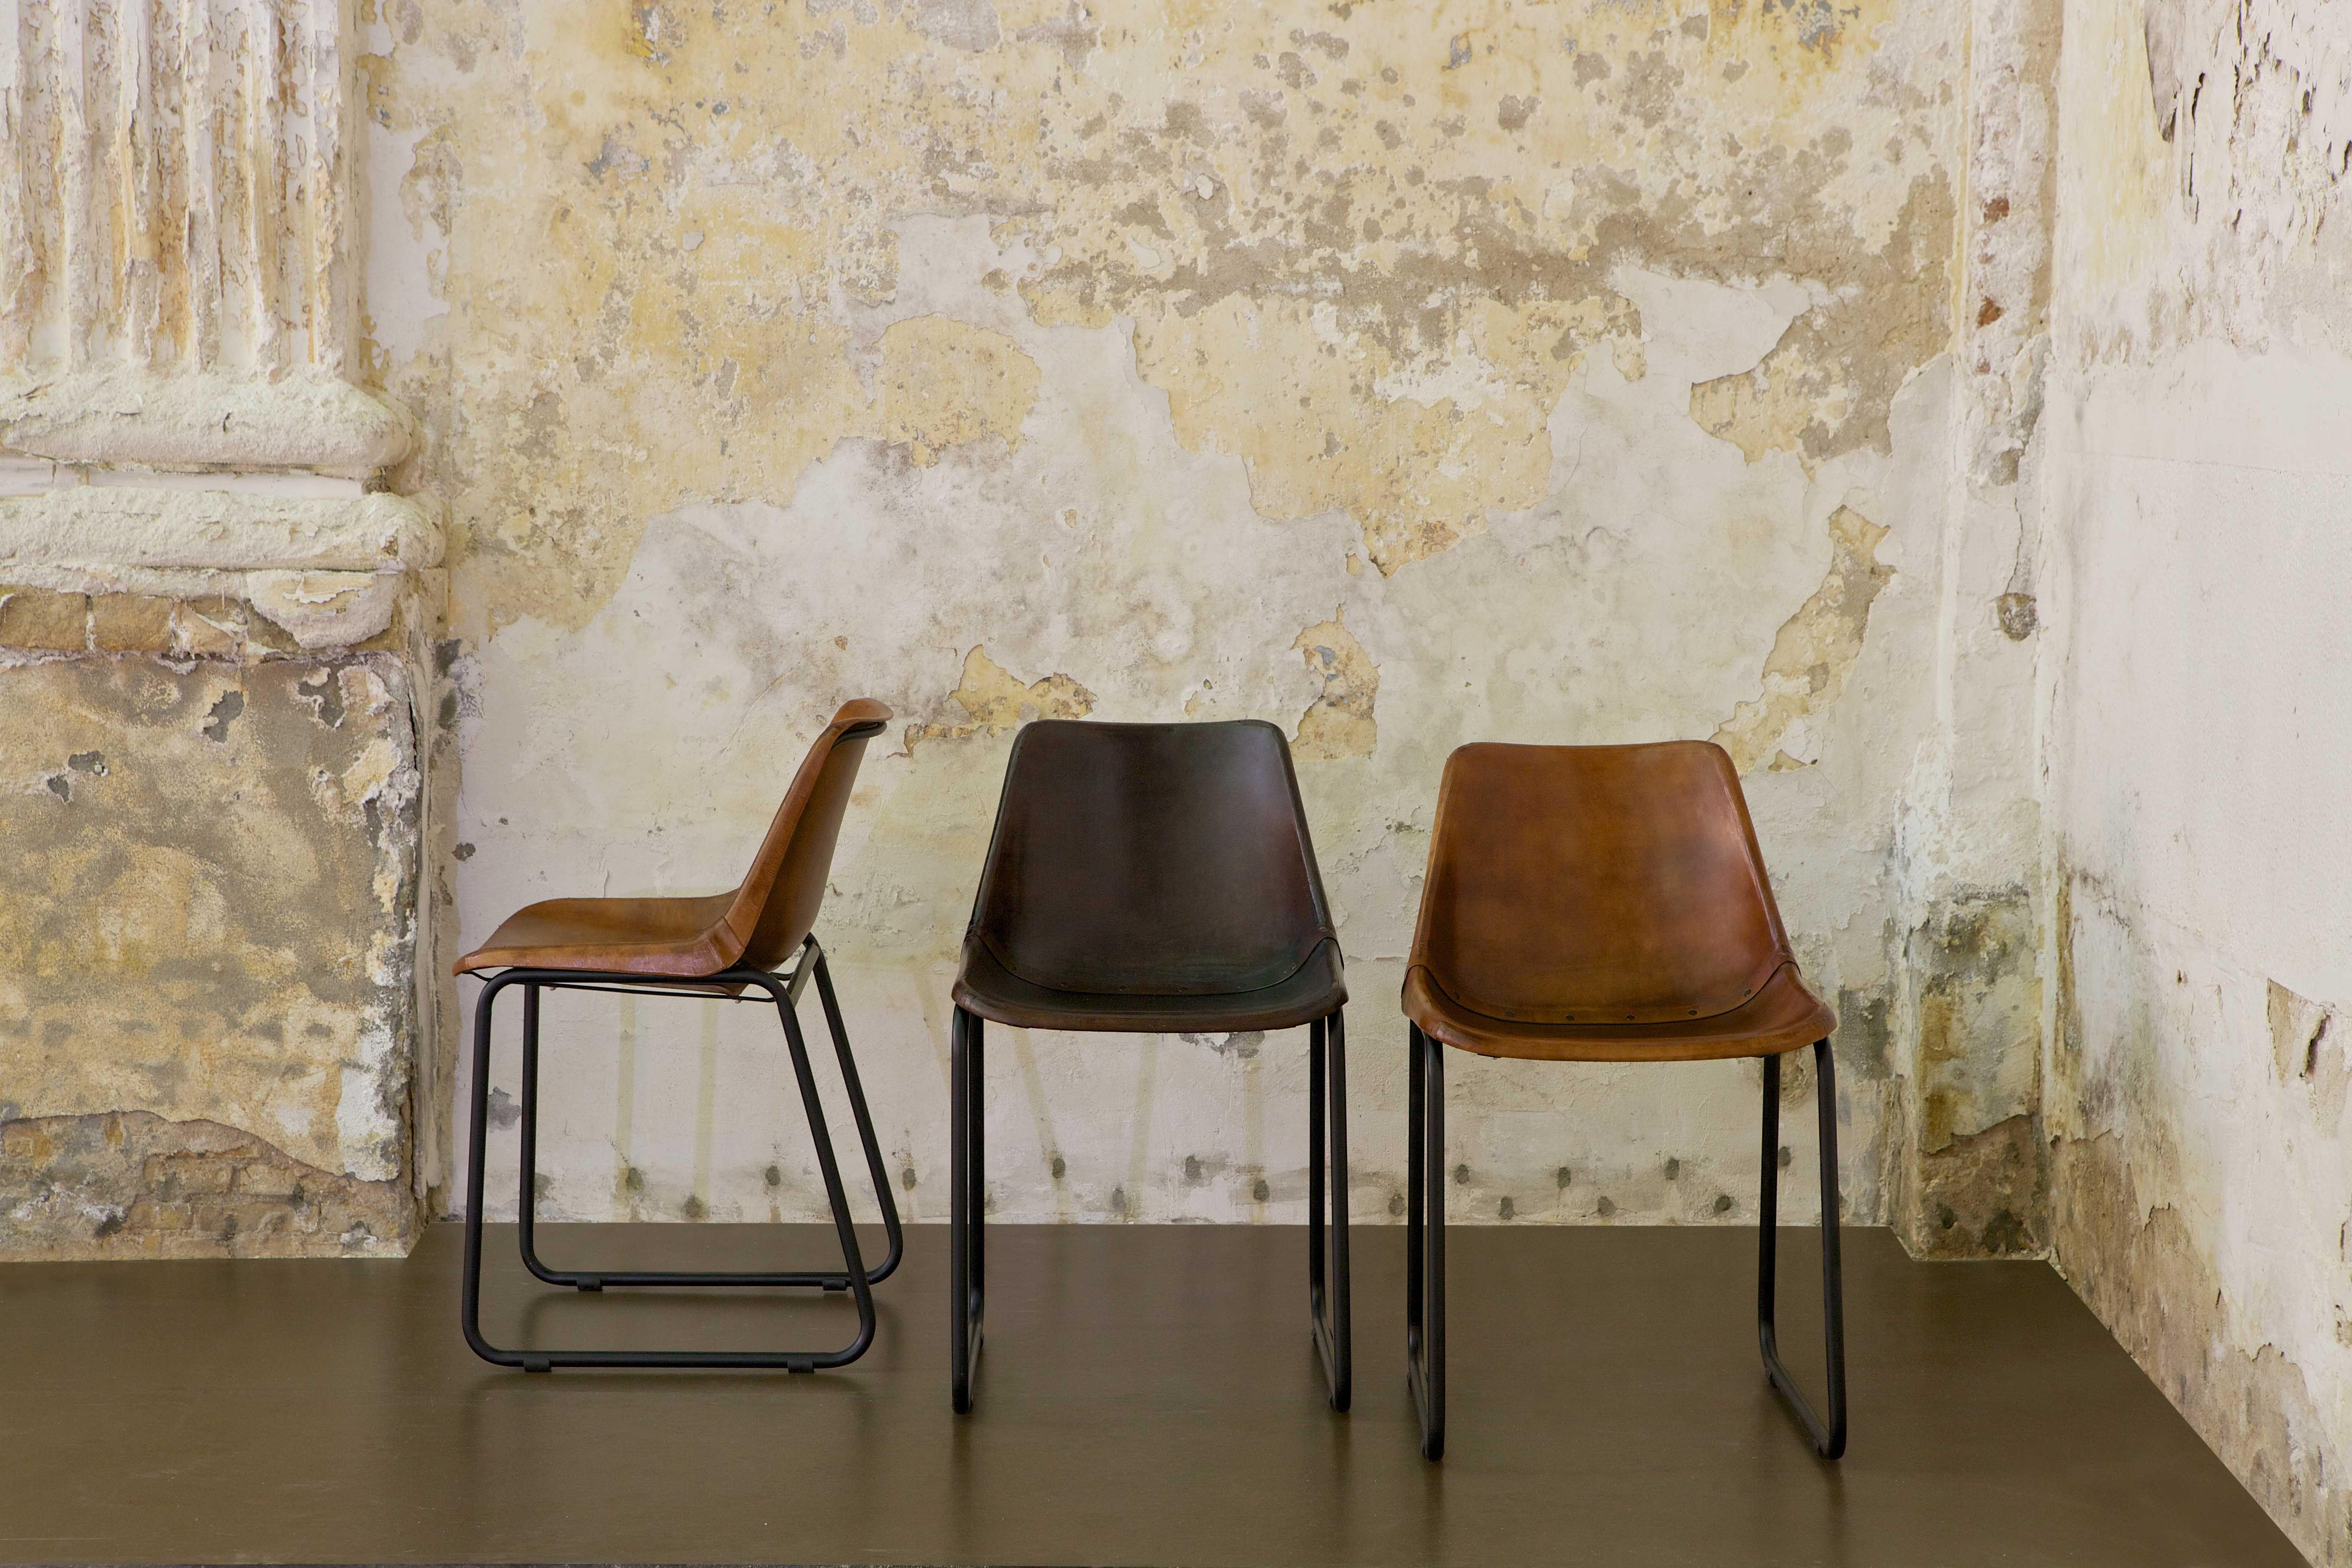 Bepurehome Rough Stoel : Bepurehome rough stoel. leren stoel leather chair ledersessel